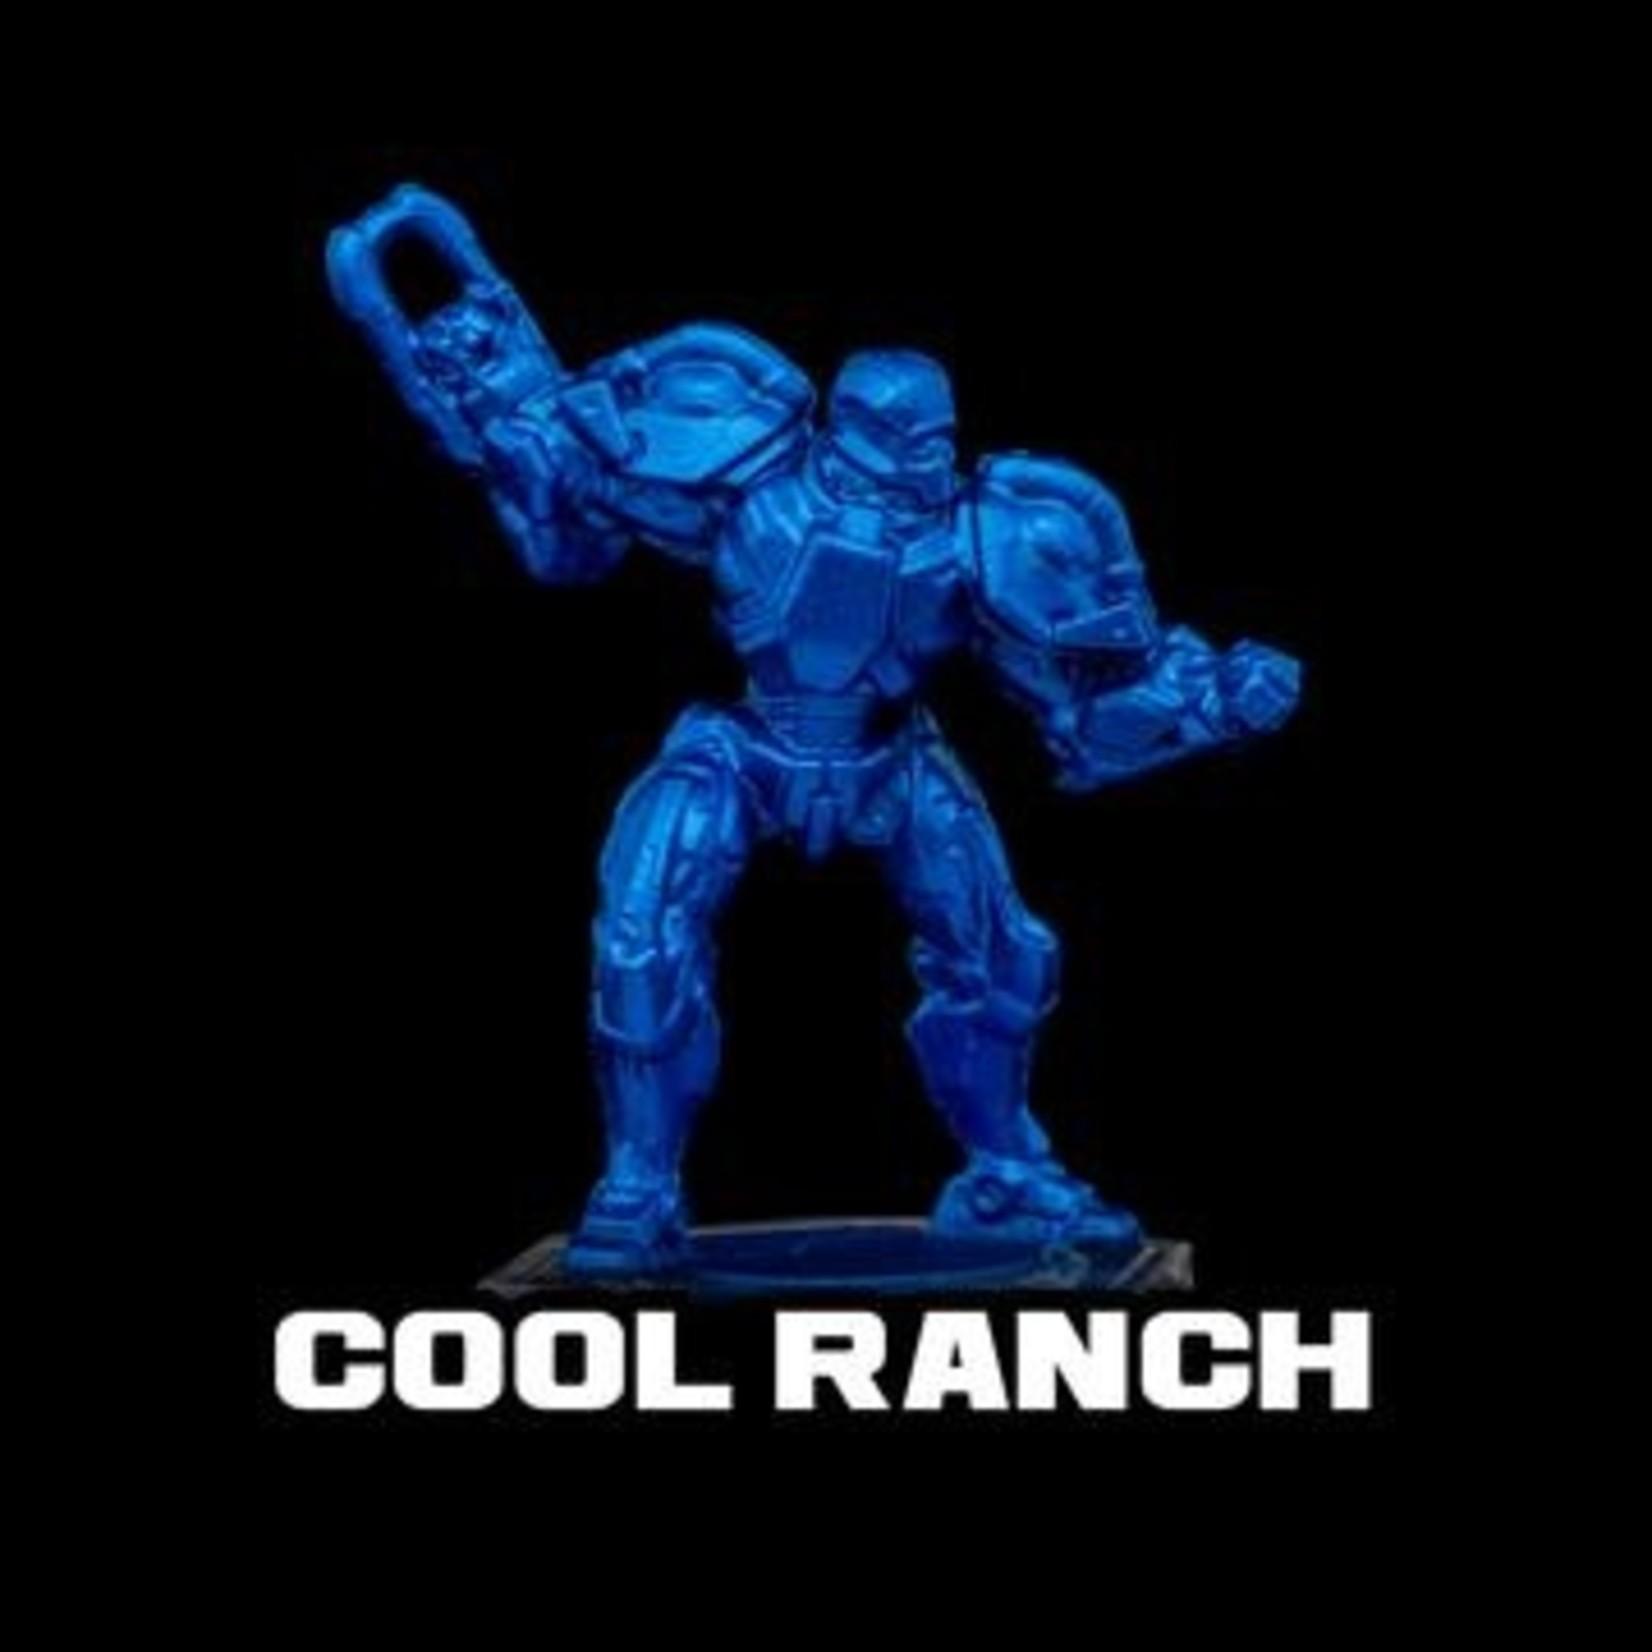 Turbo Dork Cool Ranch (Metallic)